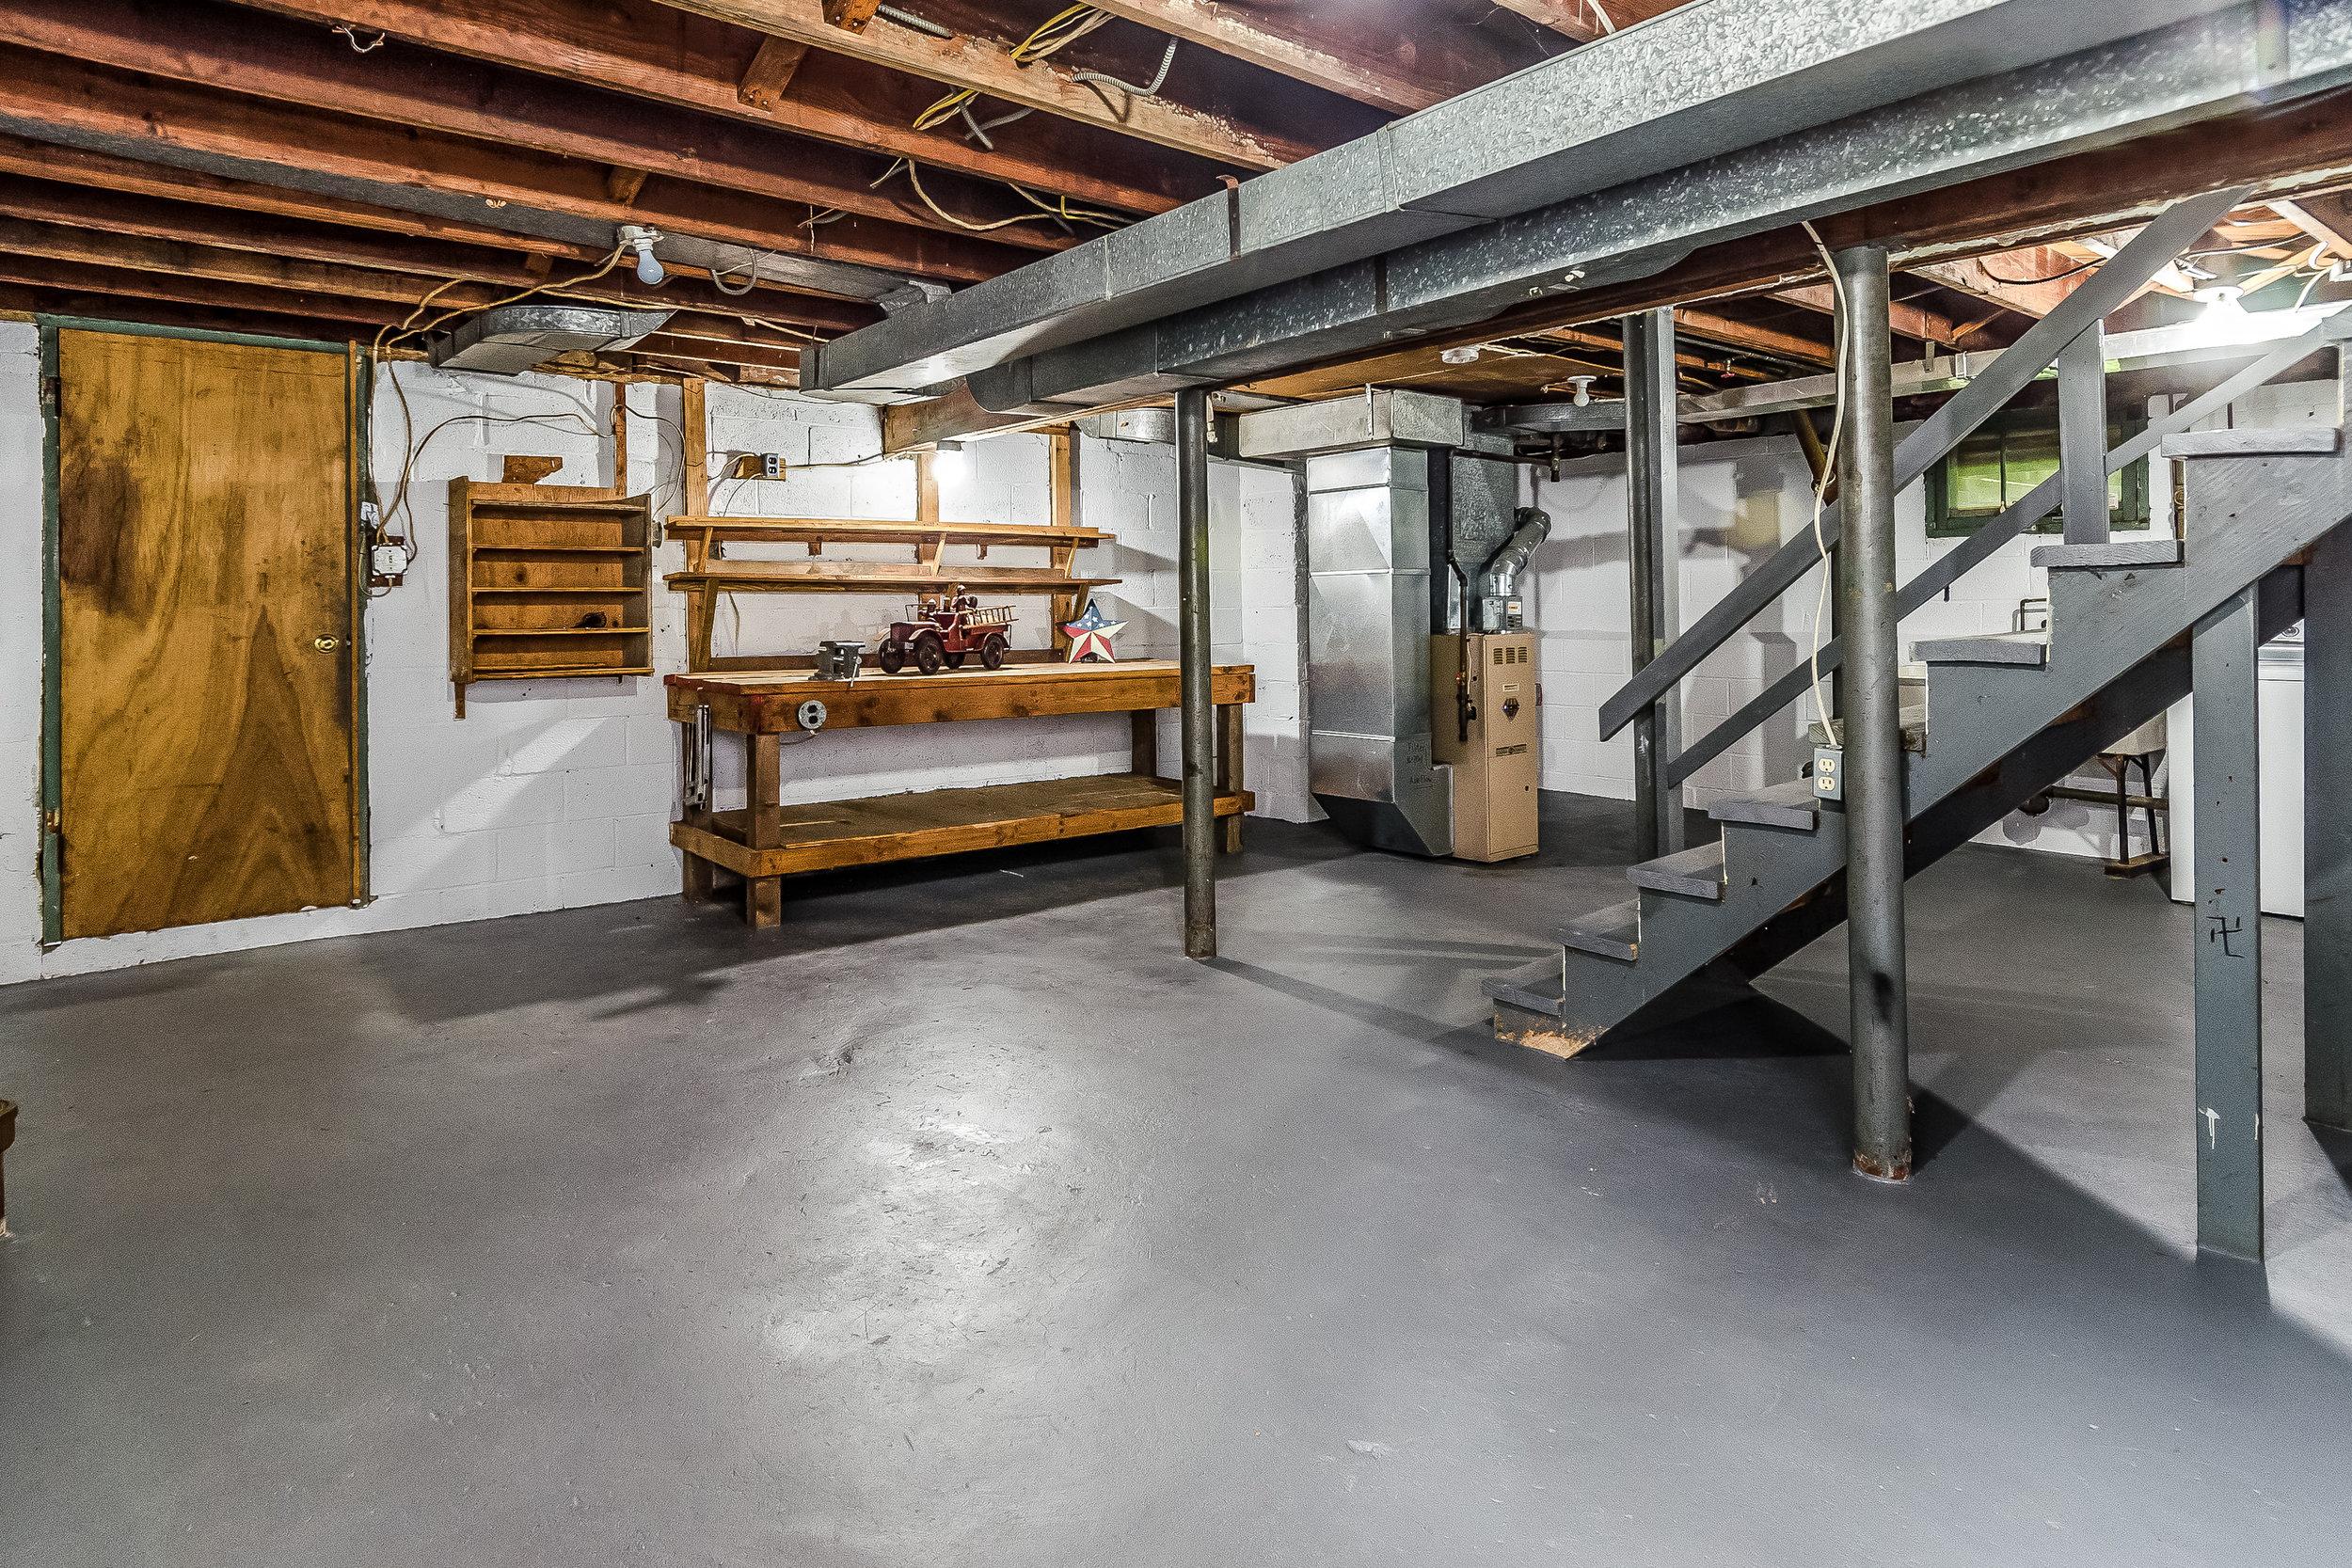 035-photo-unfinished-basement-5787032.jpg